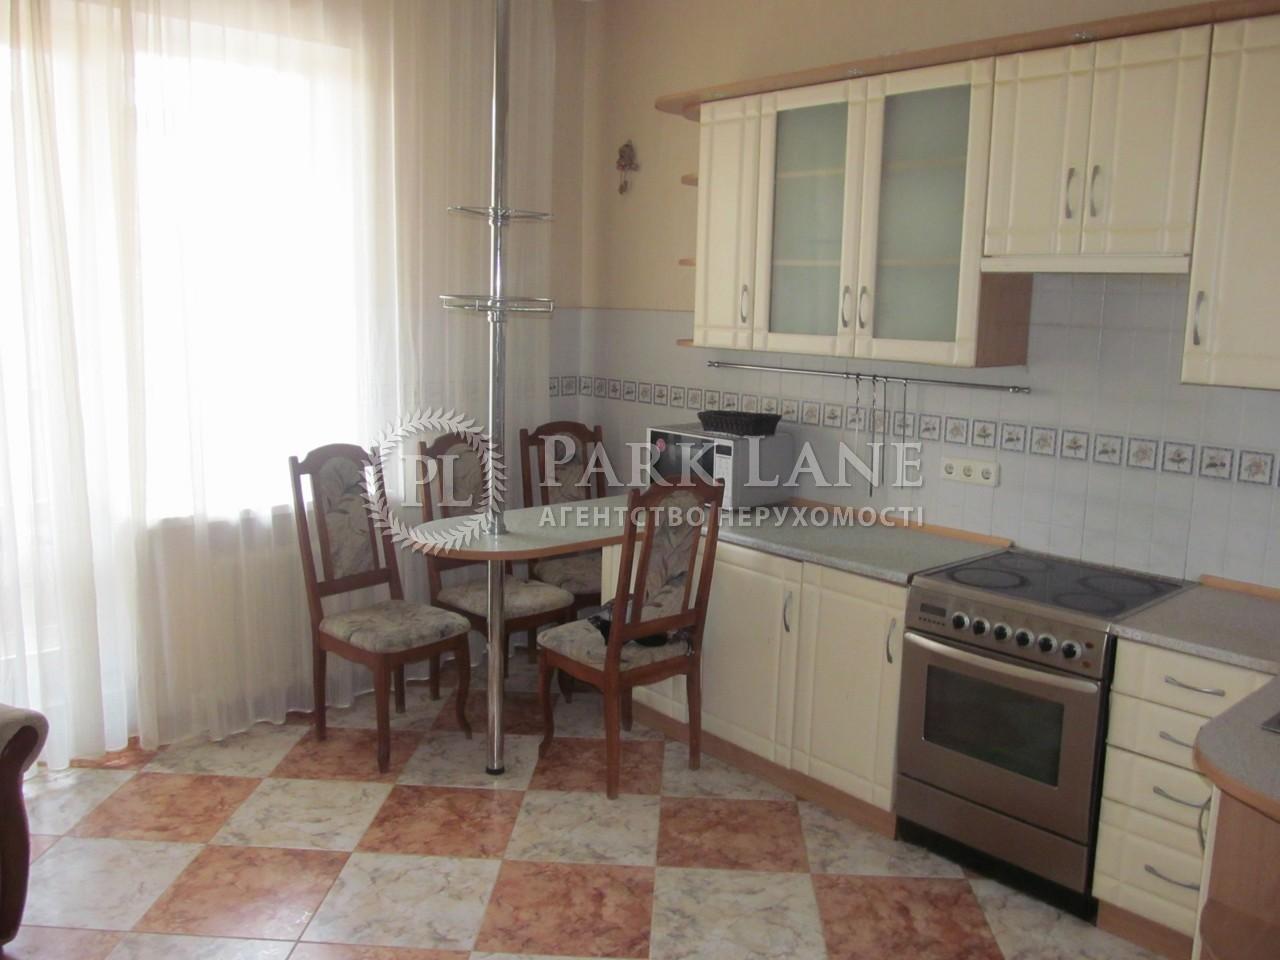 Квартира ул. Леваневского, 6, Киев, Z-309663 - Фото 6